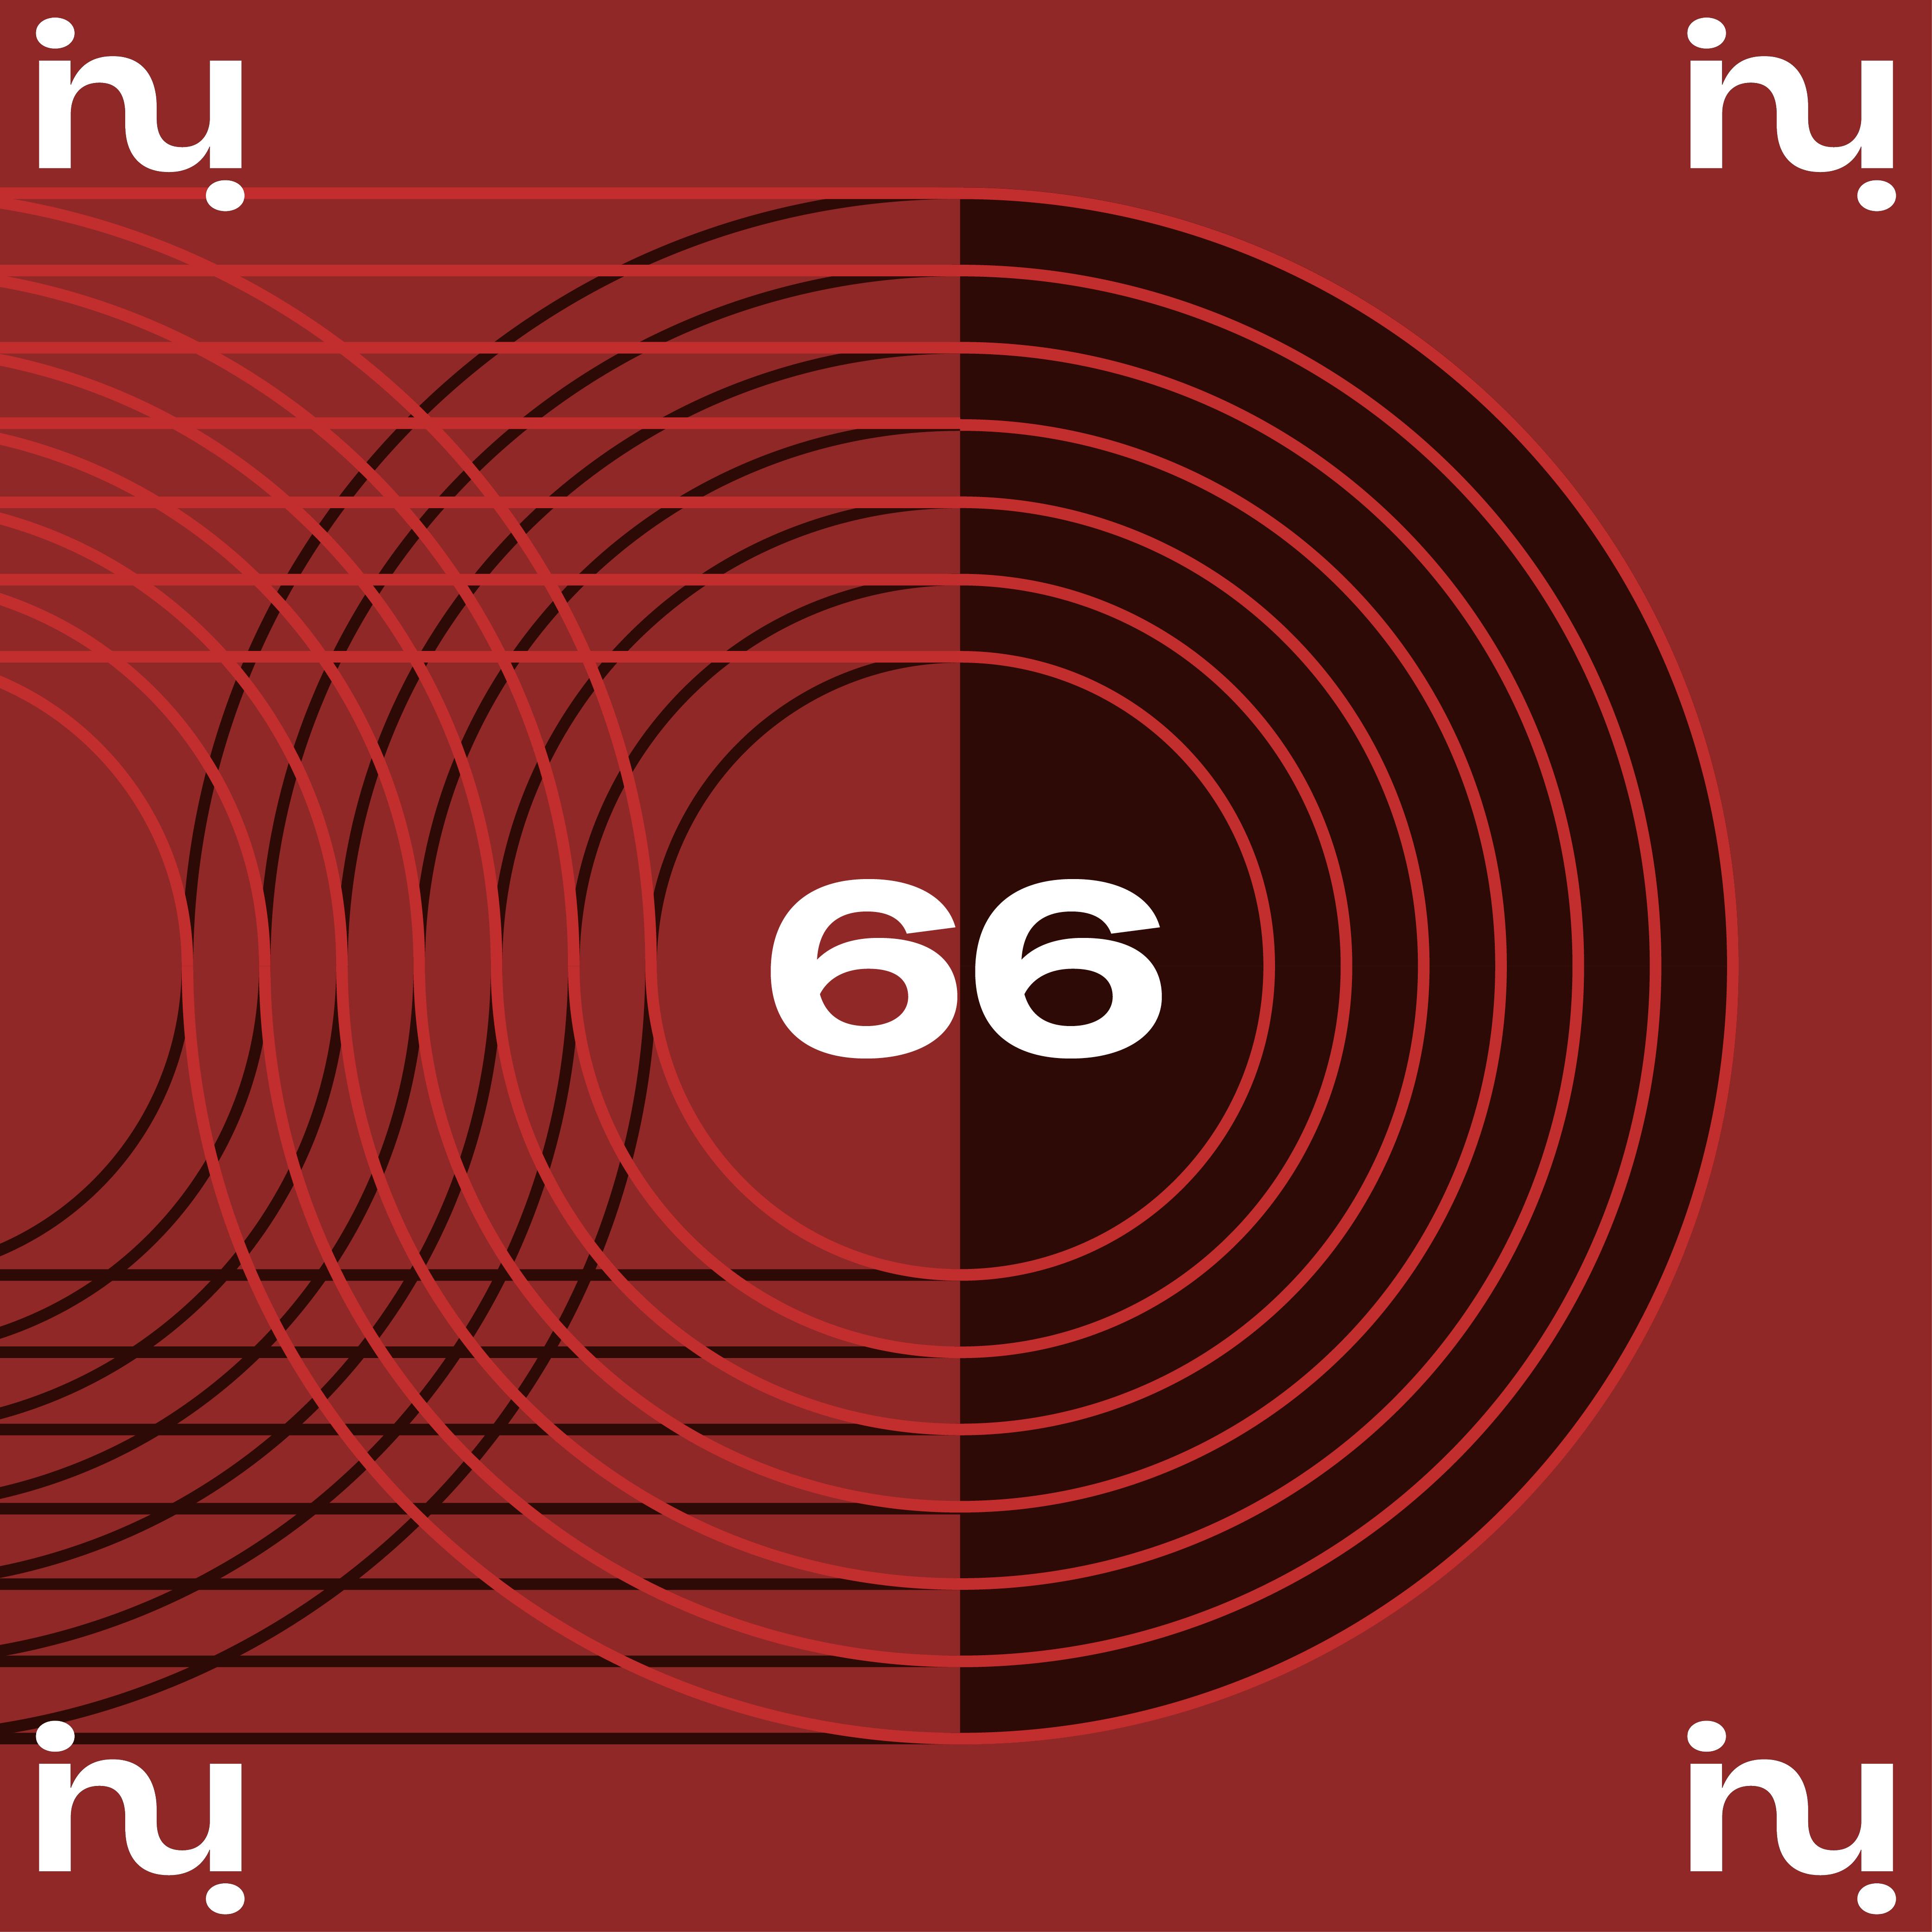 LISTENUP_PLAYLIST #66